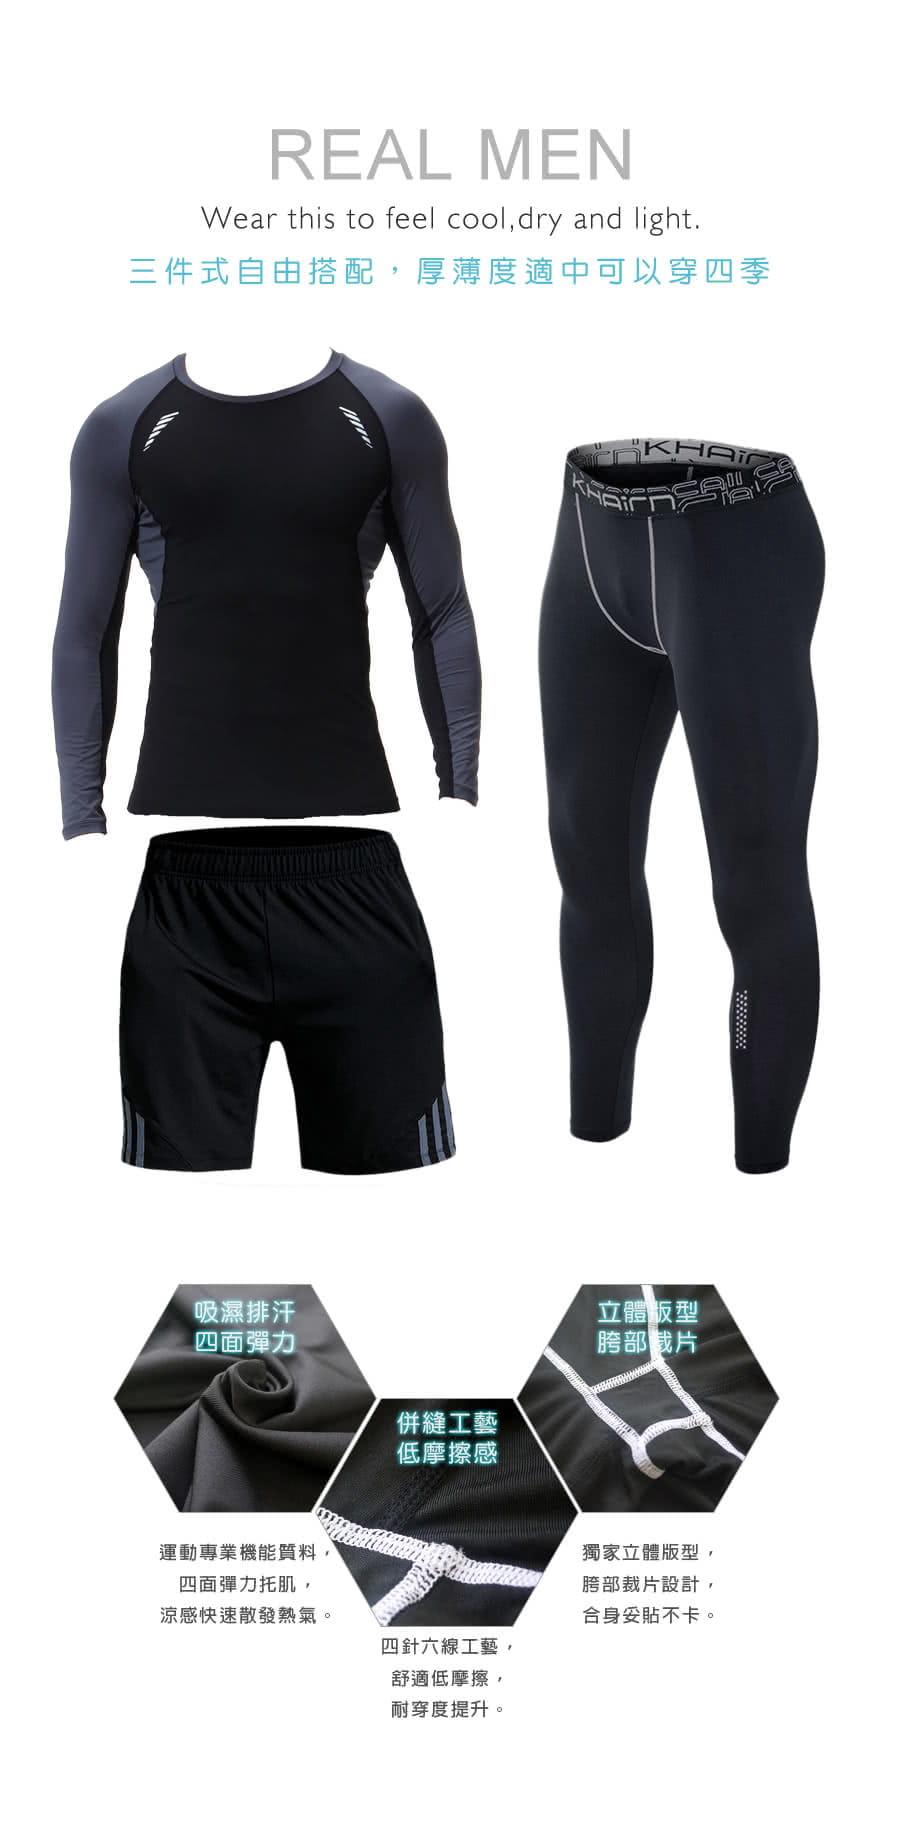 【Un-Sport高機能】型男專業吸排速乾三件式運動套組(長袖+短褲+緊身長褲) 7